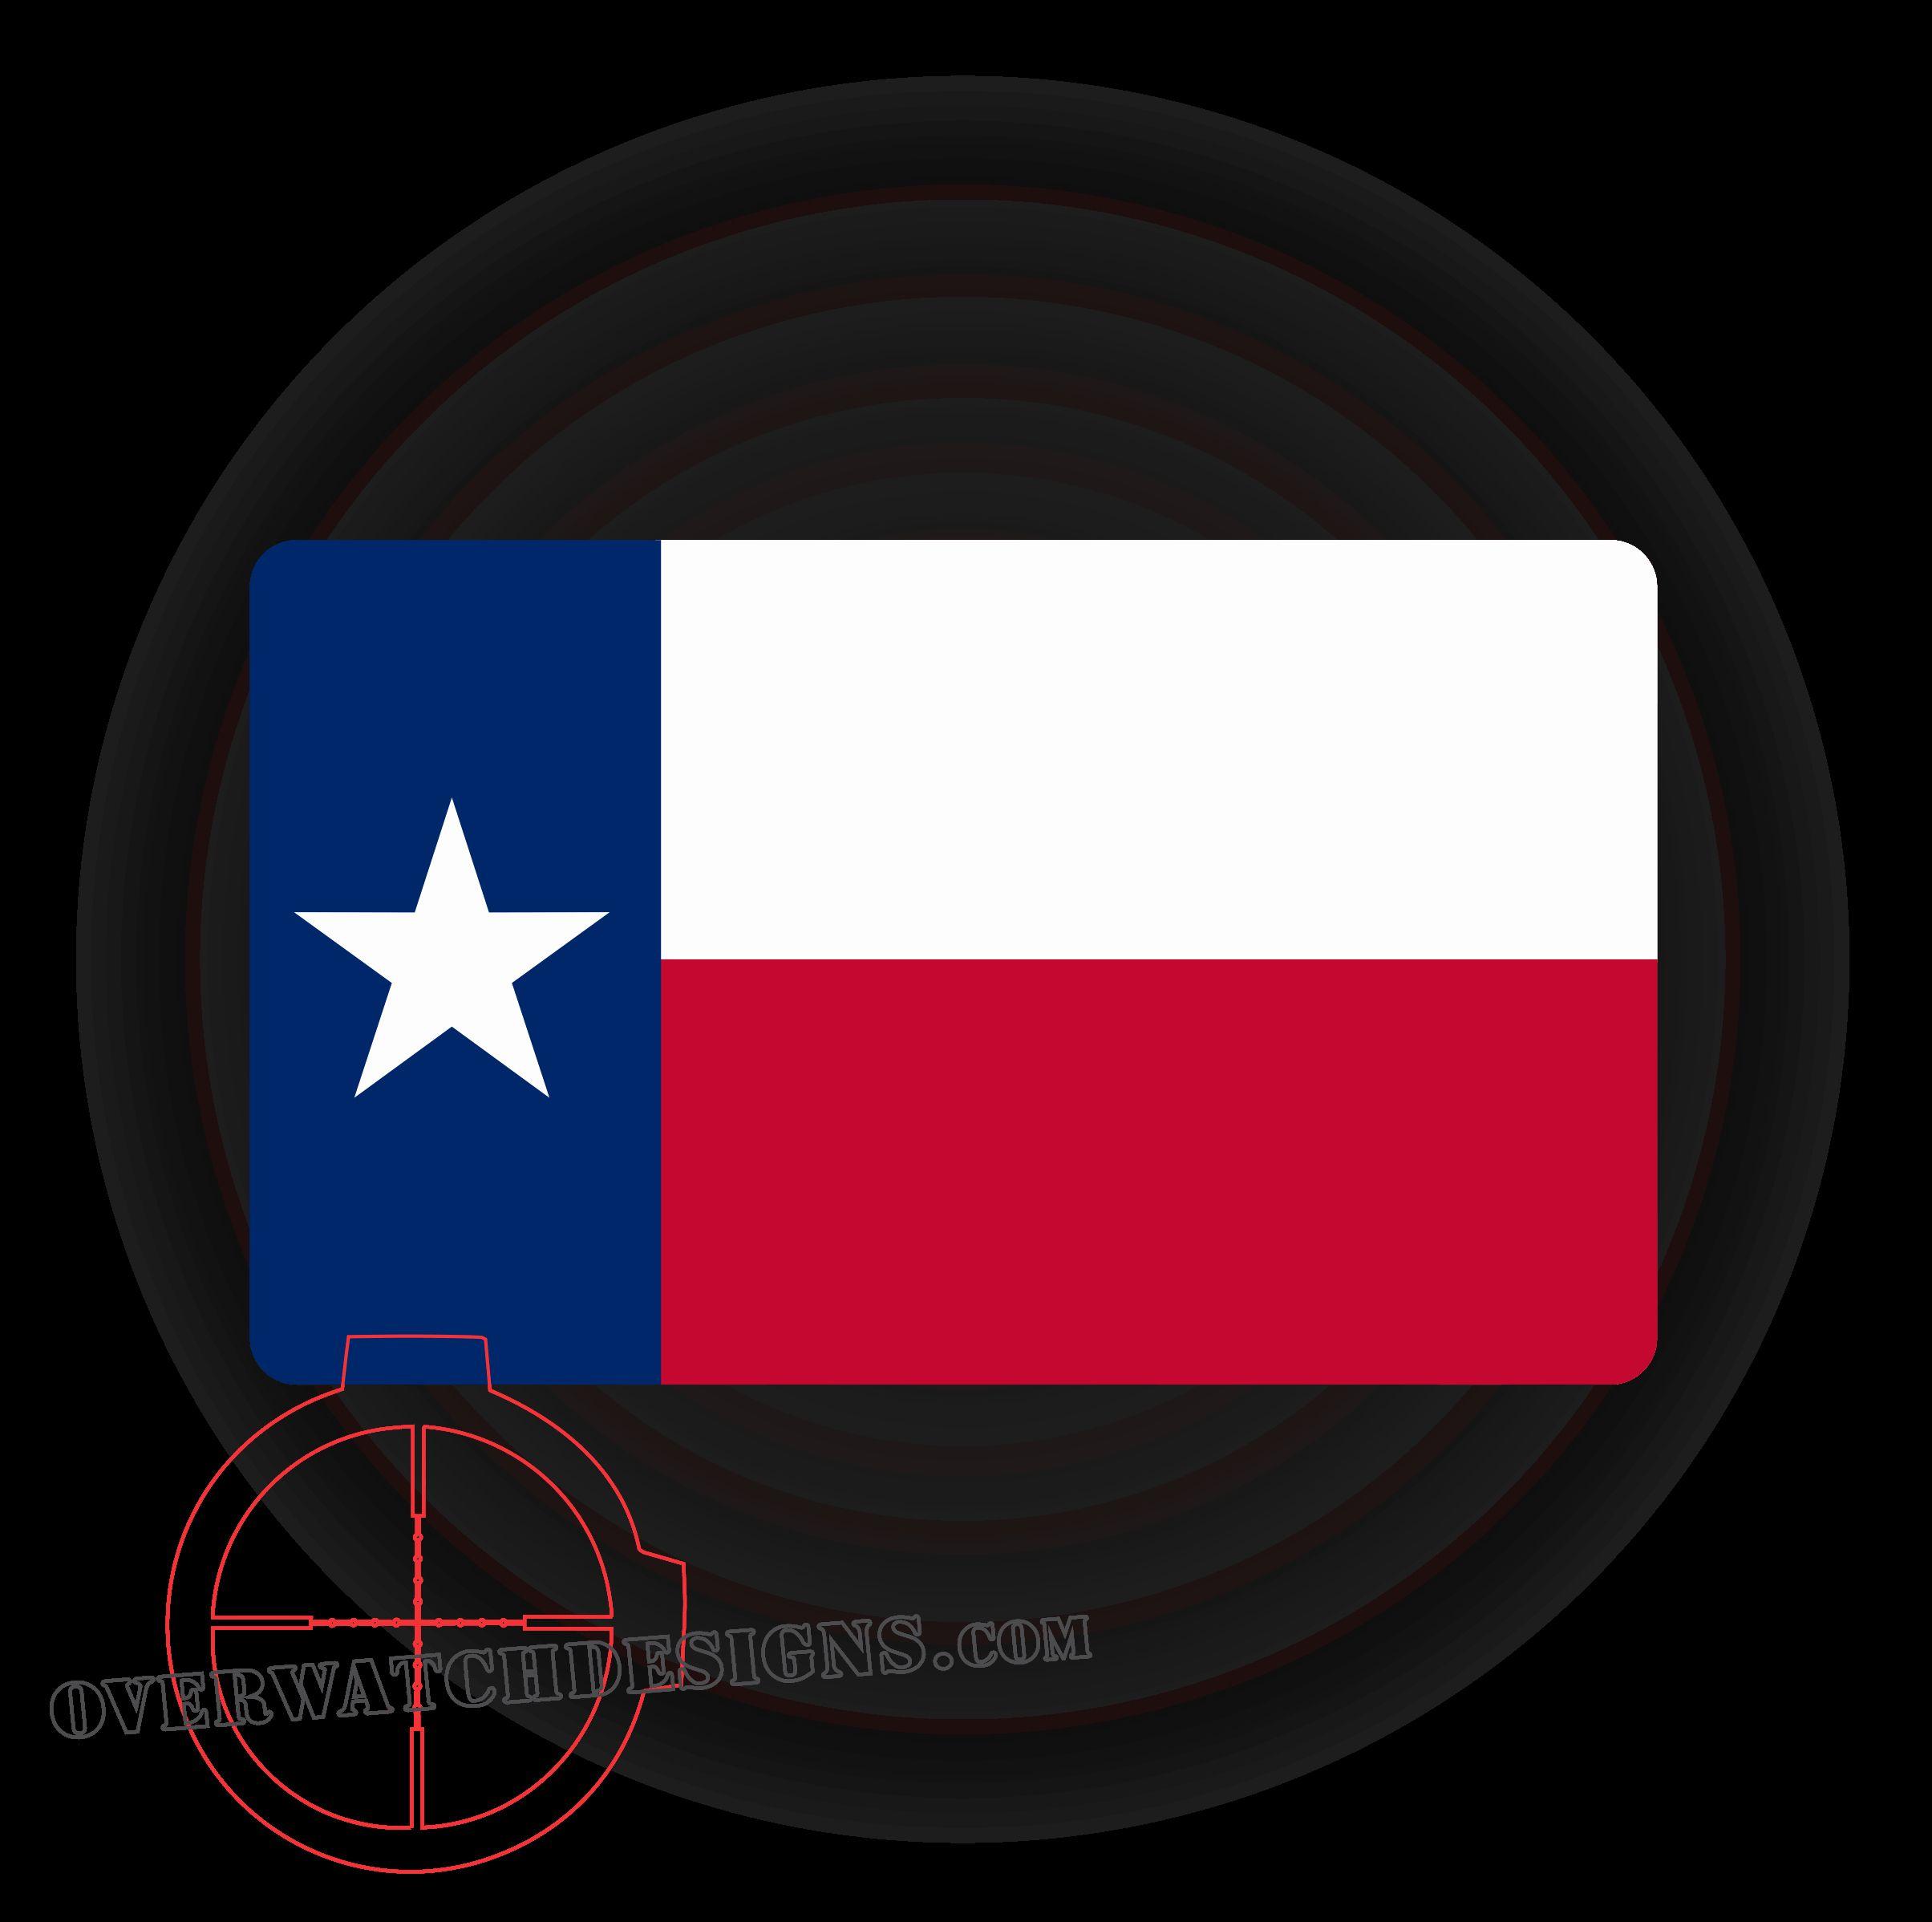 Texas Flag Coloring Page Elegant Texas Flag Overwatch Designs In 2020 Flag Coloring Pages Coloring Pages Flag Colors